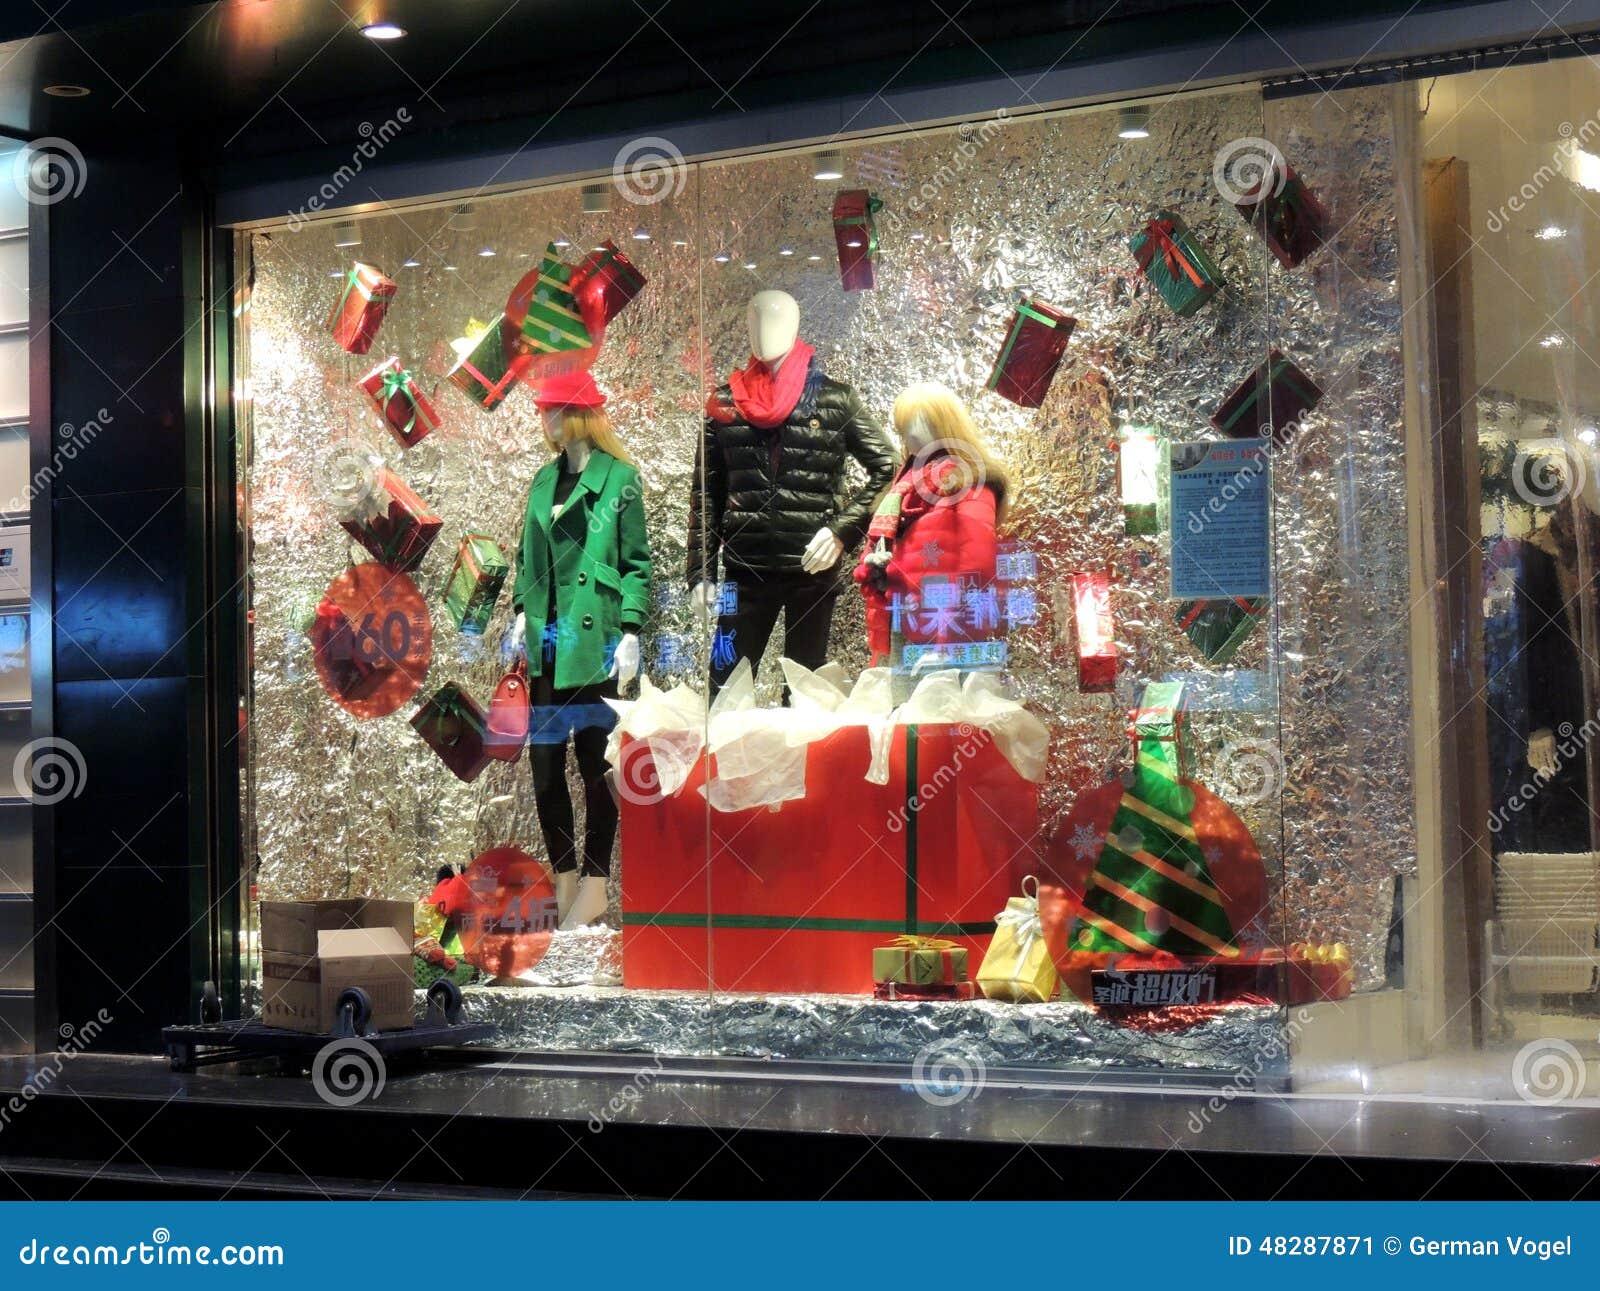 Leyenda China El Regalo Que No Se Ve: Décorations De Noël De Façade De Boutique De Vêtements